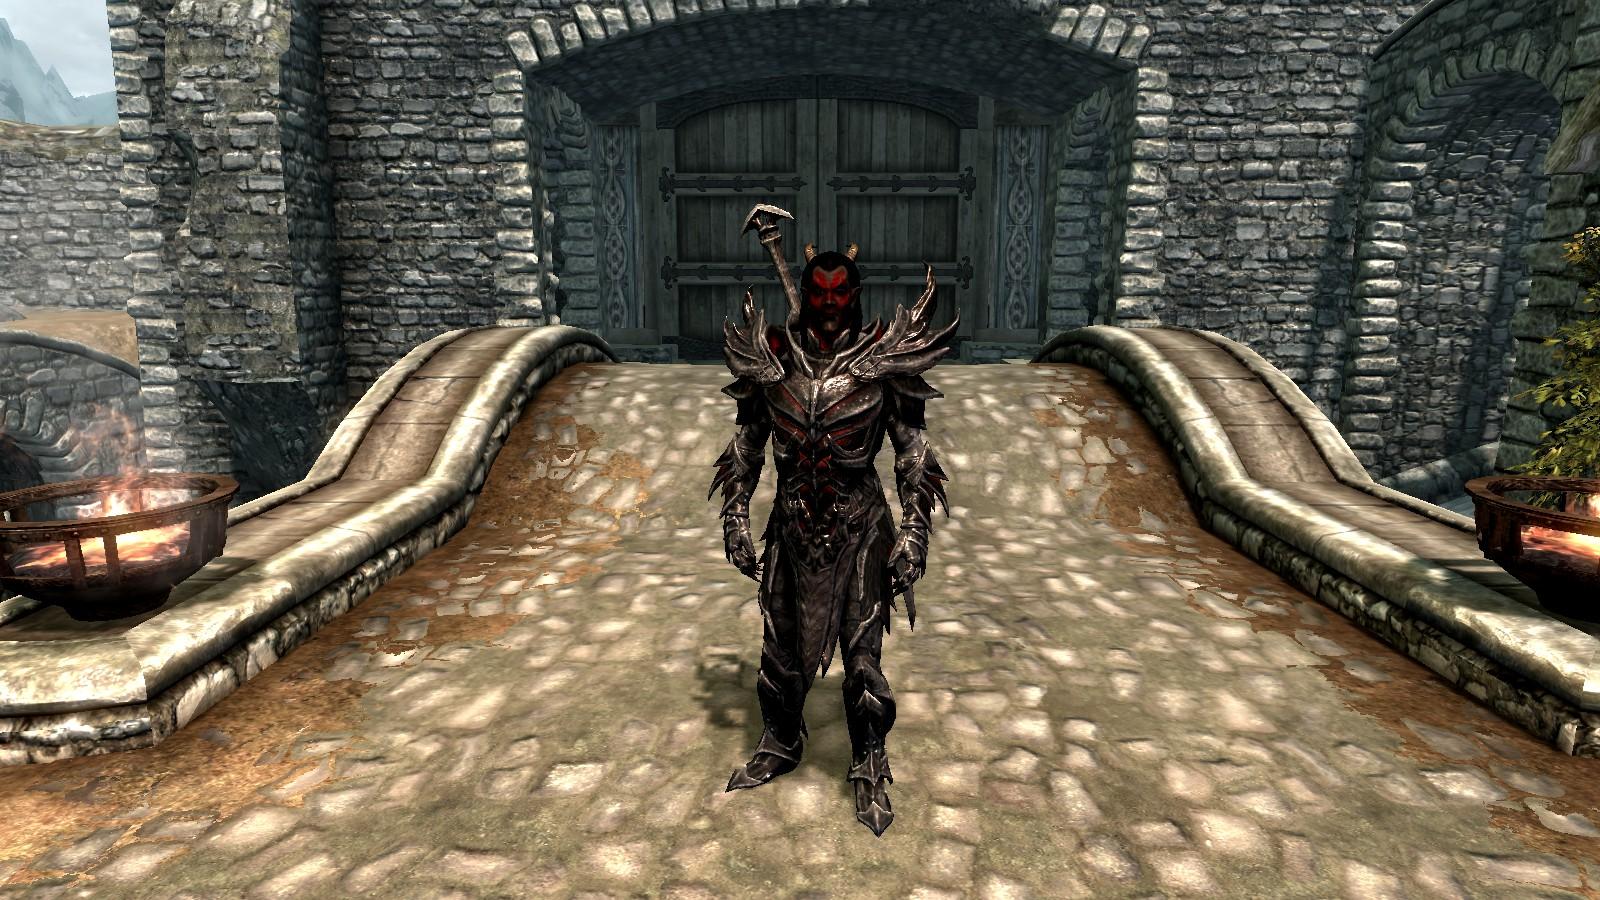 Skyrim Battle - Strongest Undead vs Strongest Dremora &amp- and more ...